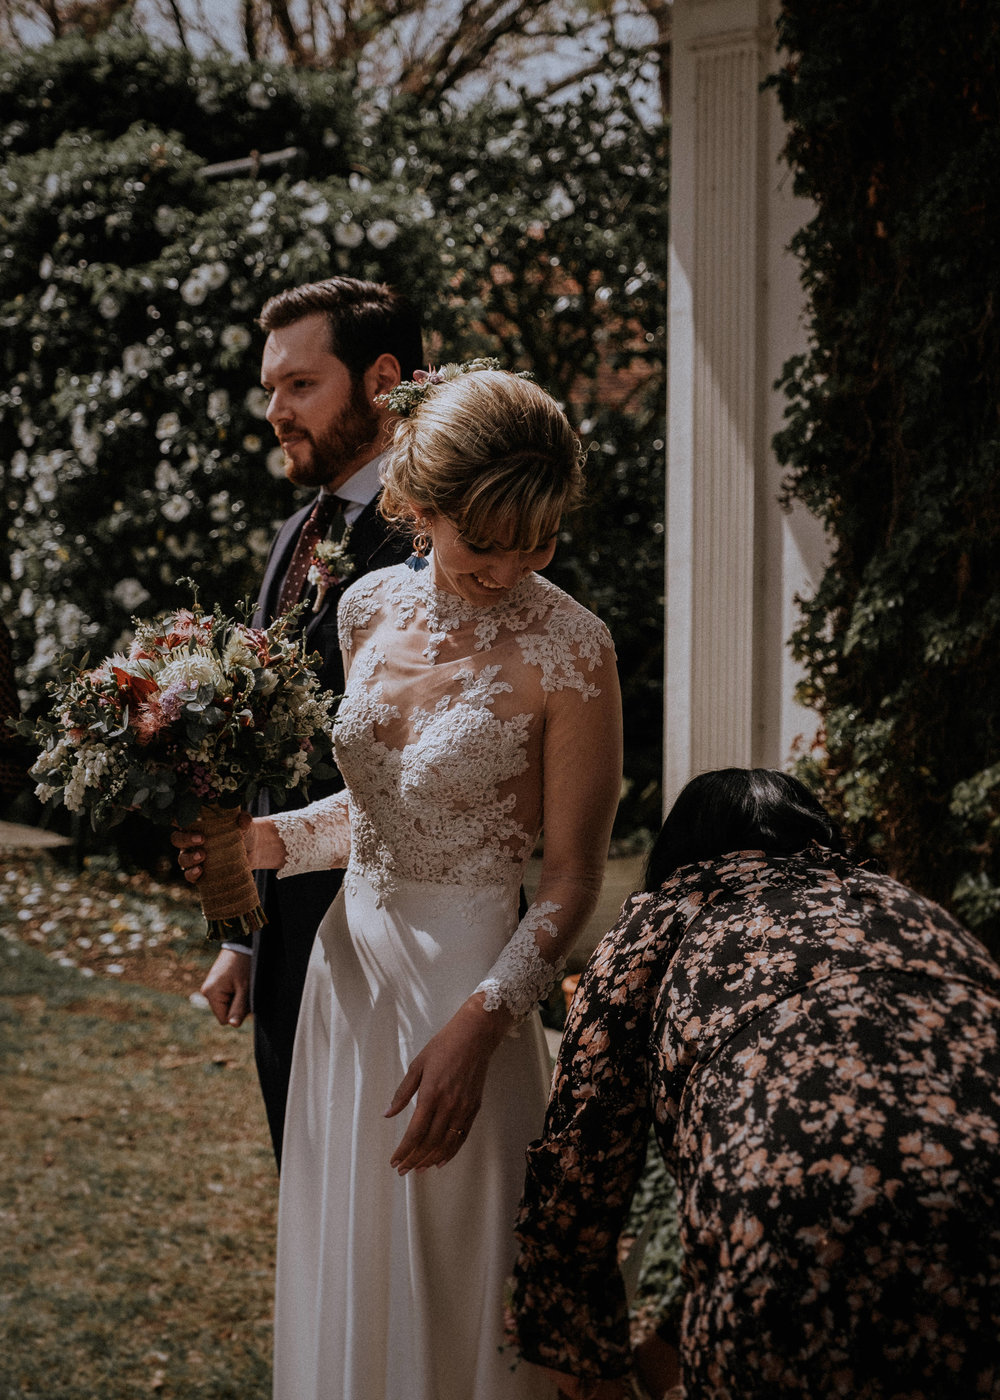 R+M_elopement wedding photography_kings & thieves_blog (127 of 326).jpg